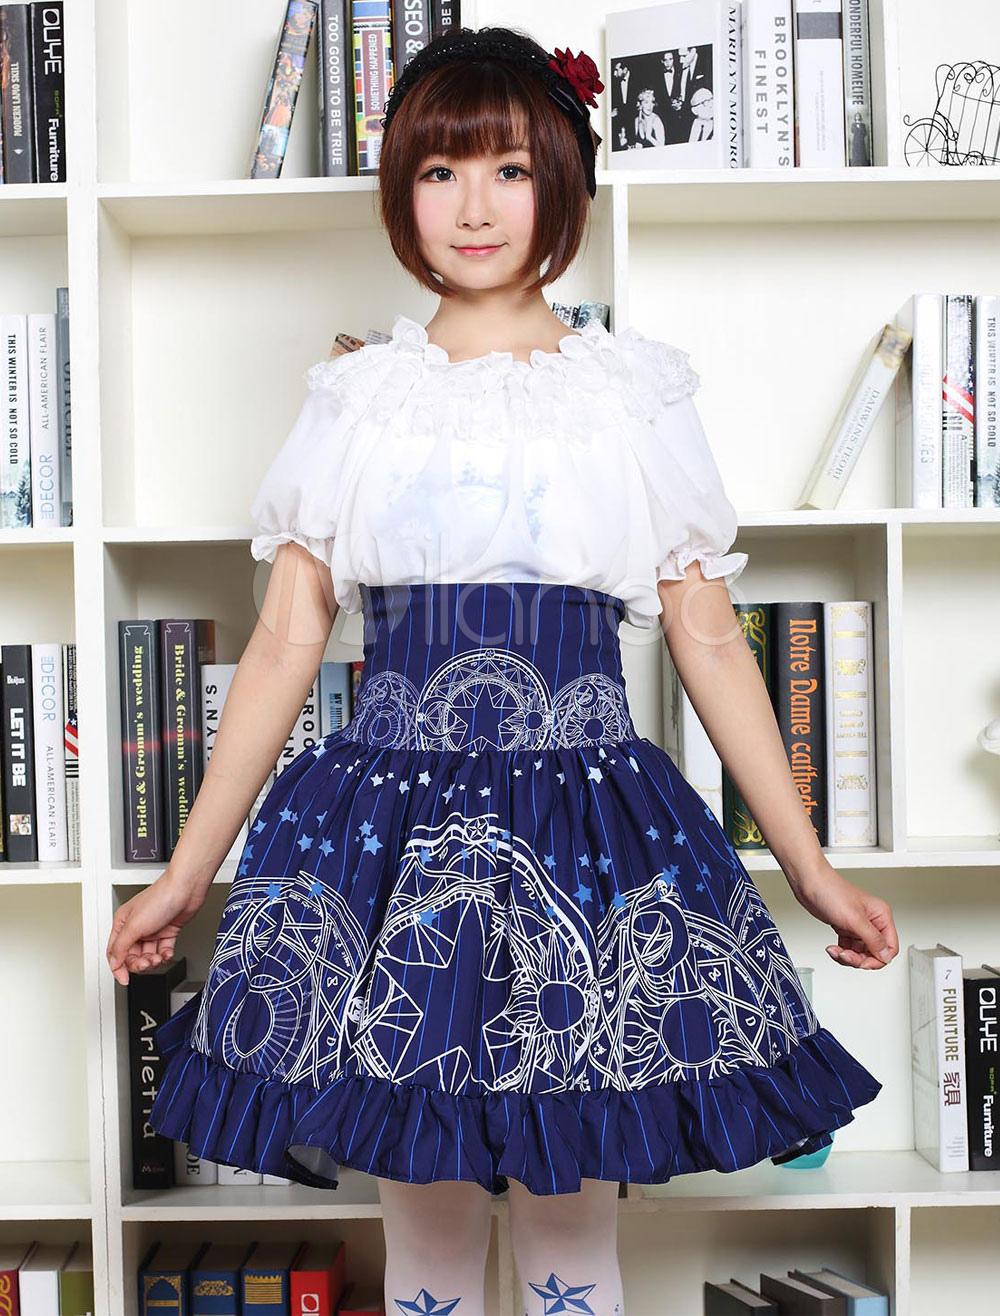 Buy Sweet Lolita Dress SK Blue Lolita Dress High Waist Magic Array Printed Ruffle Hem Pleated Lolita Skirt for $45.99 in Milanoo store